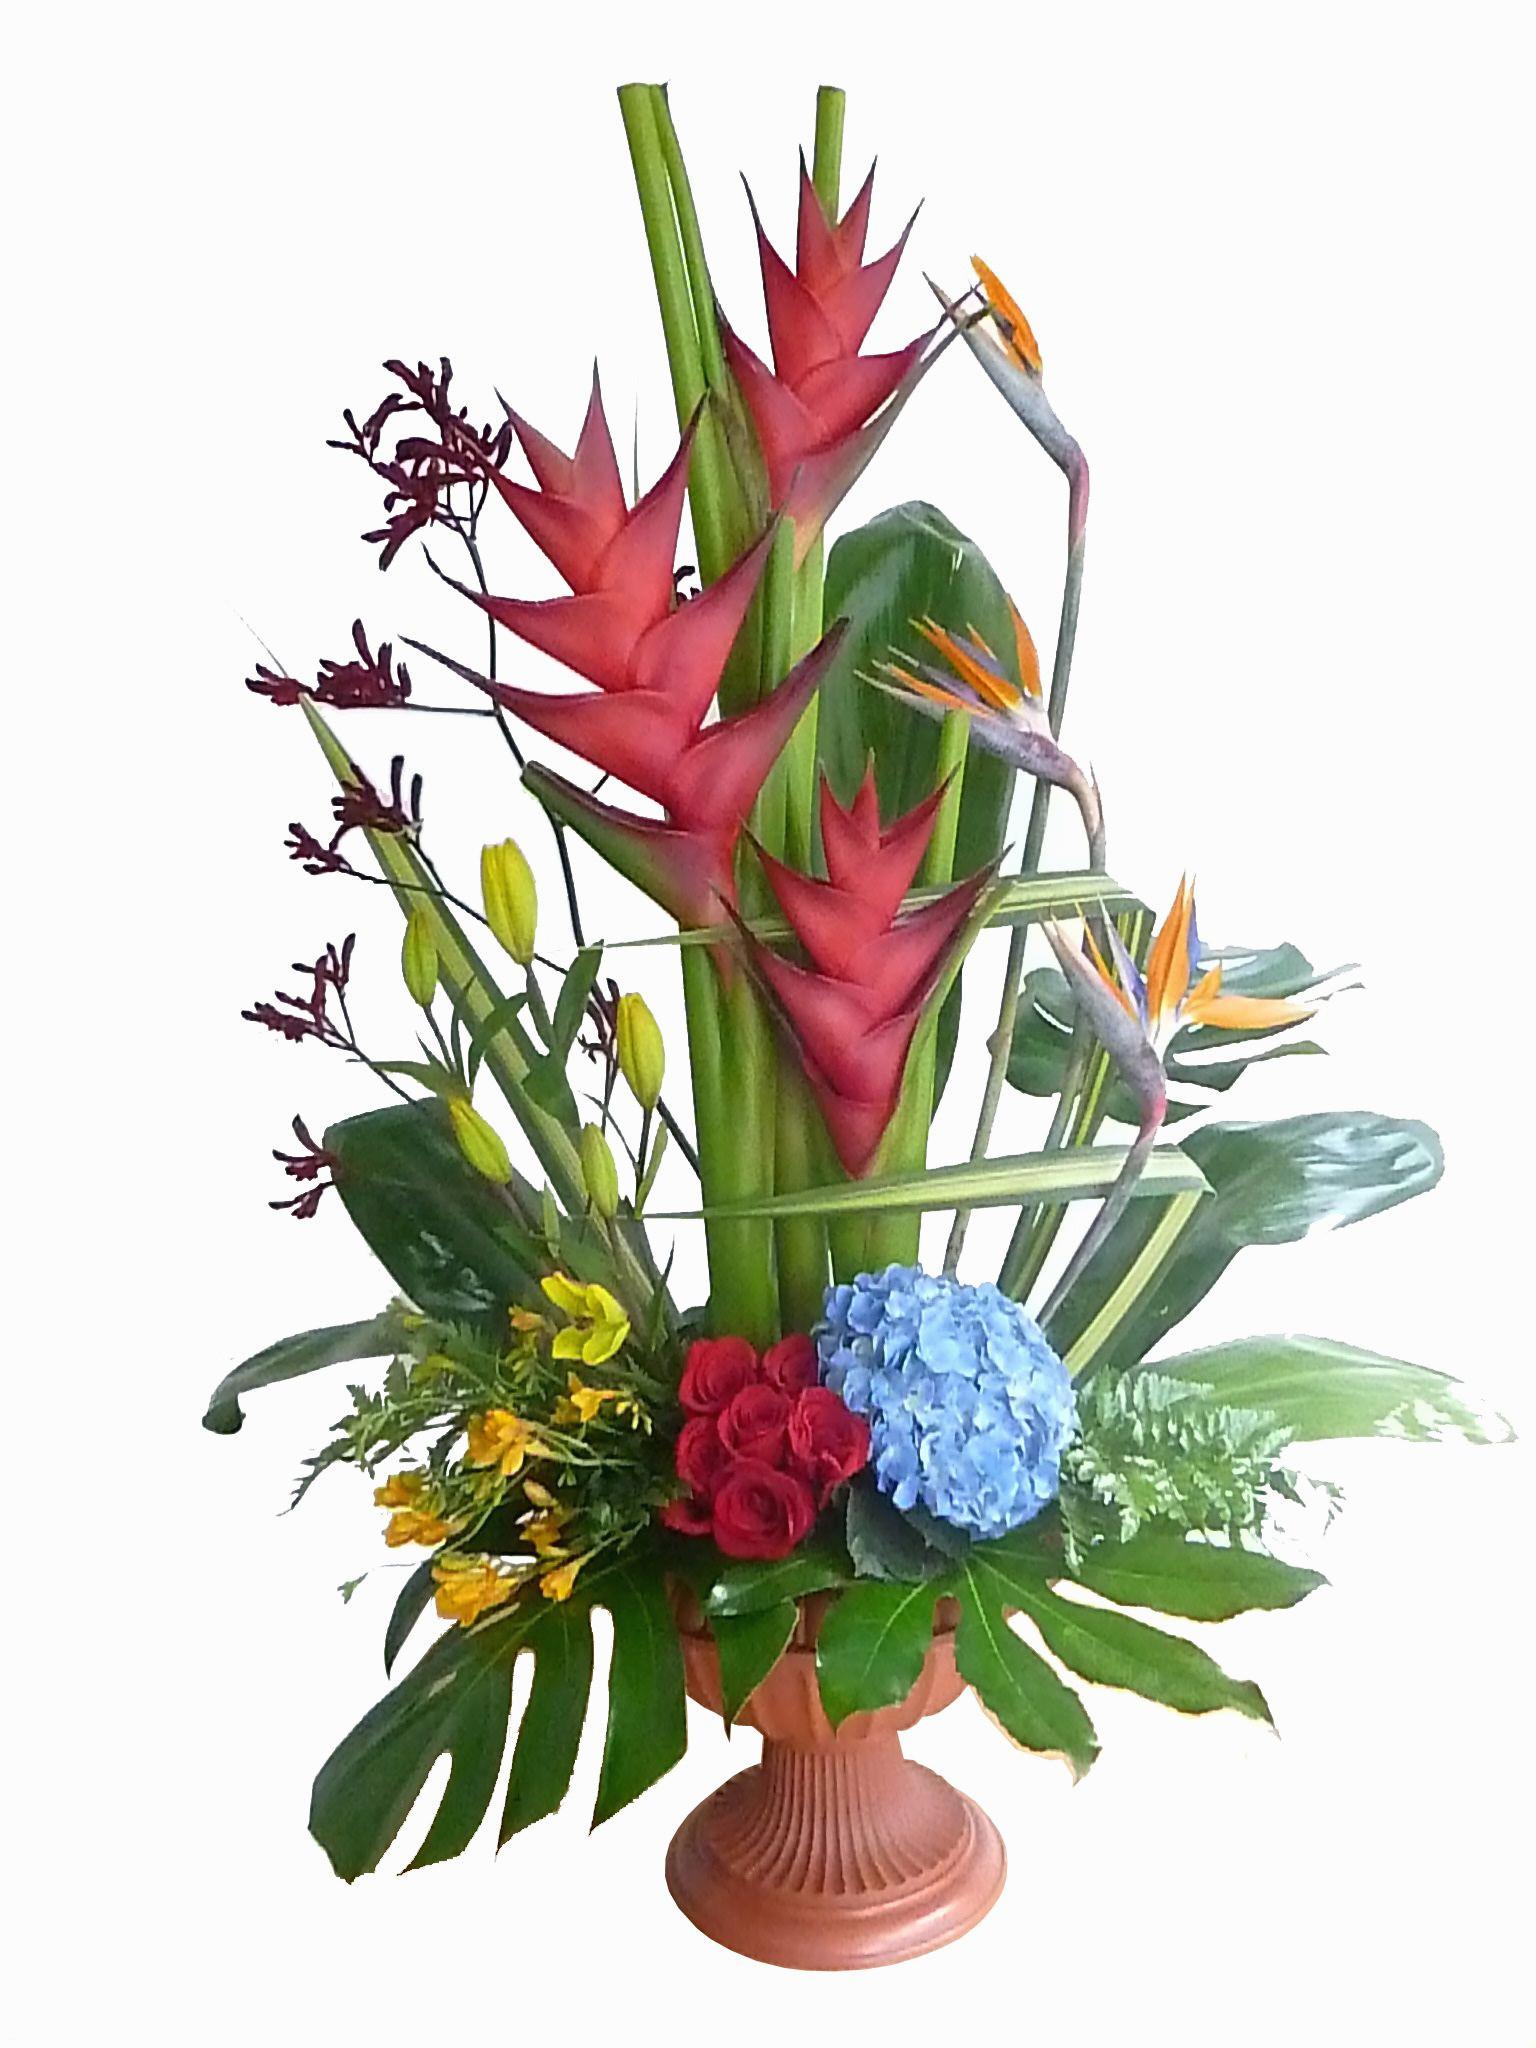 long rectangular flower vase of elegant flower vase table 04h vases tablei 0d clipart dining base with beautiful decoracion con flores exoticas helioconias aves de paraiso sobre of elegant flower vase table 04h